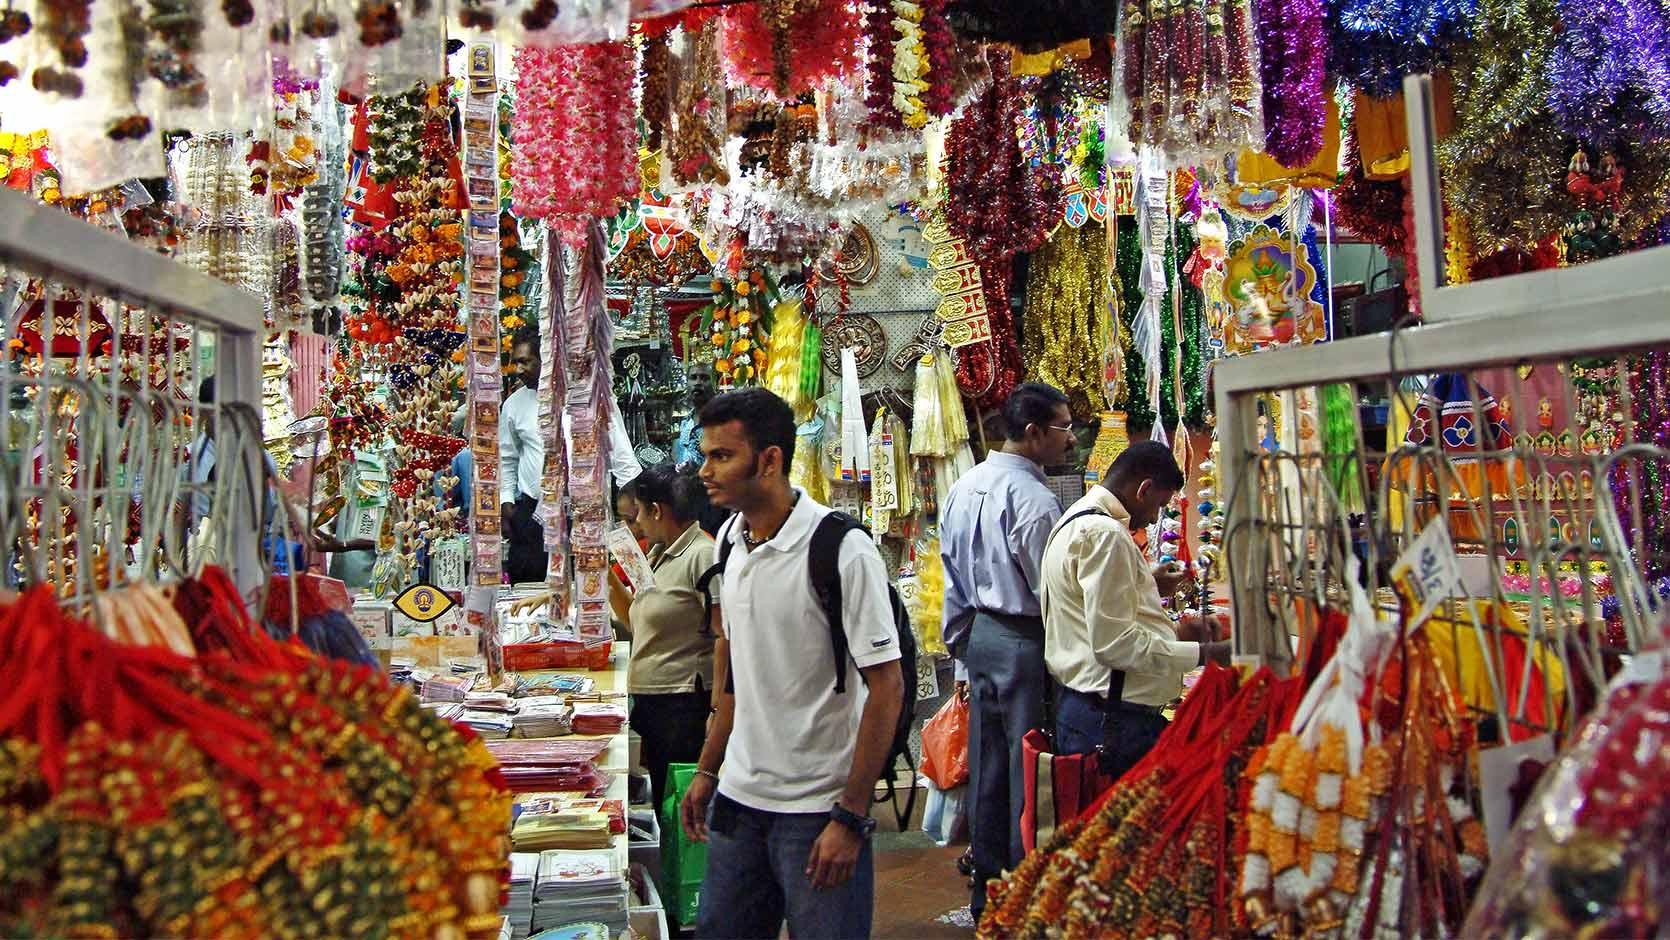 Best kept shopping secrets by precinct - Visit Singapore ...